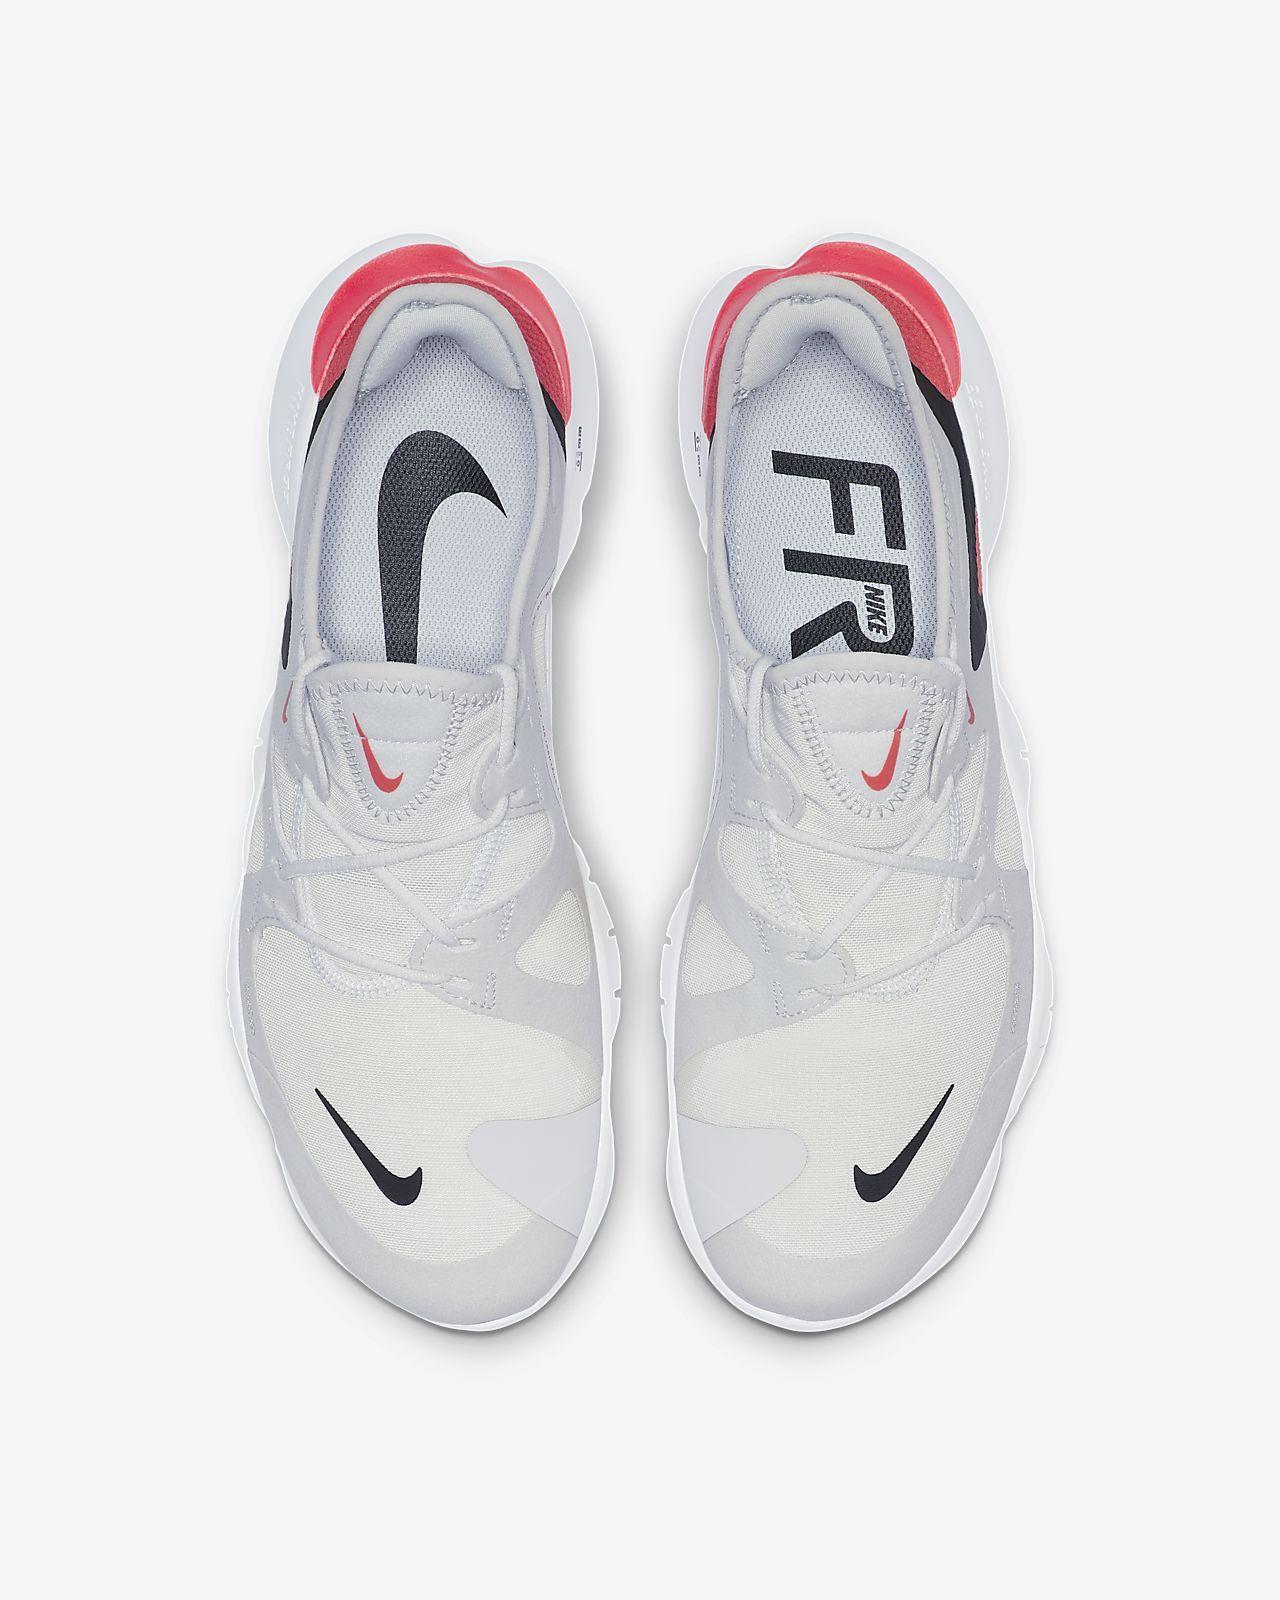 Nike Free Rn 5 0 Men S Running Shoe Nike Com Running Shoes Nike Free Running Shoes For Men Sneakers Fashion